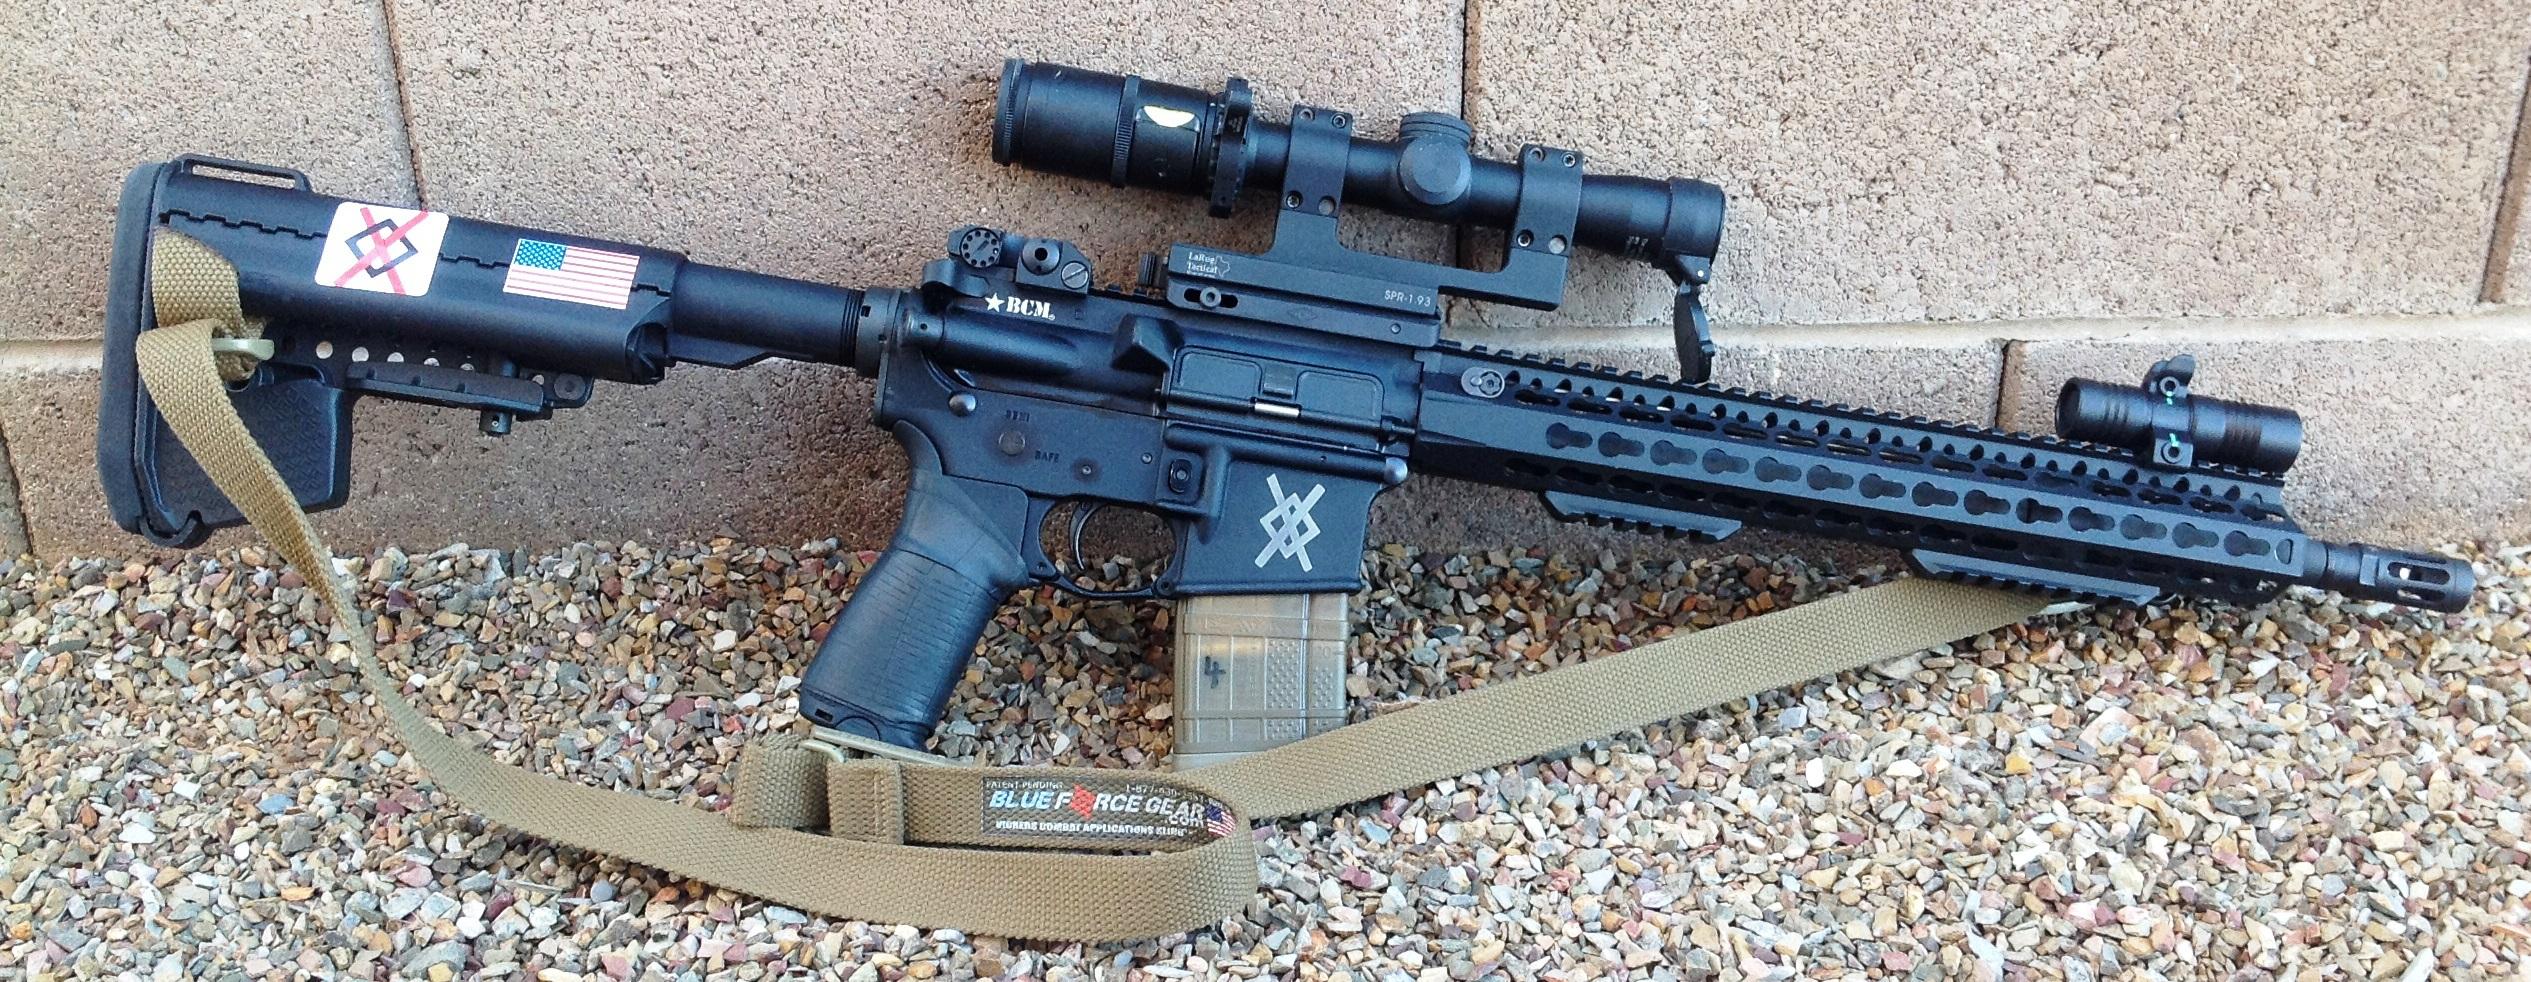 Rosch Works Rw Sl1 Sight Light Integrated Weapon Light